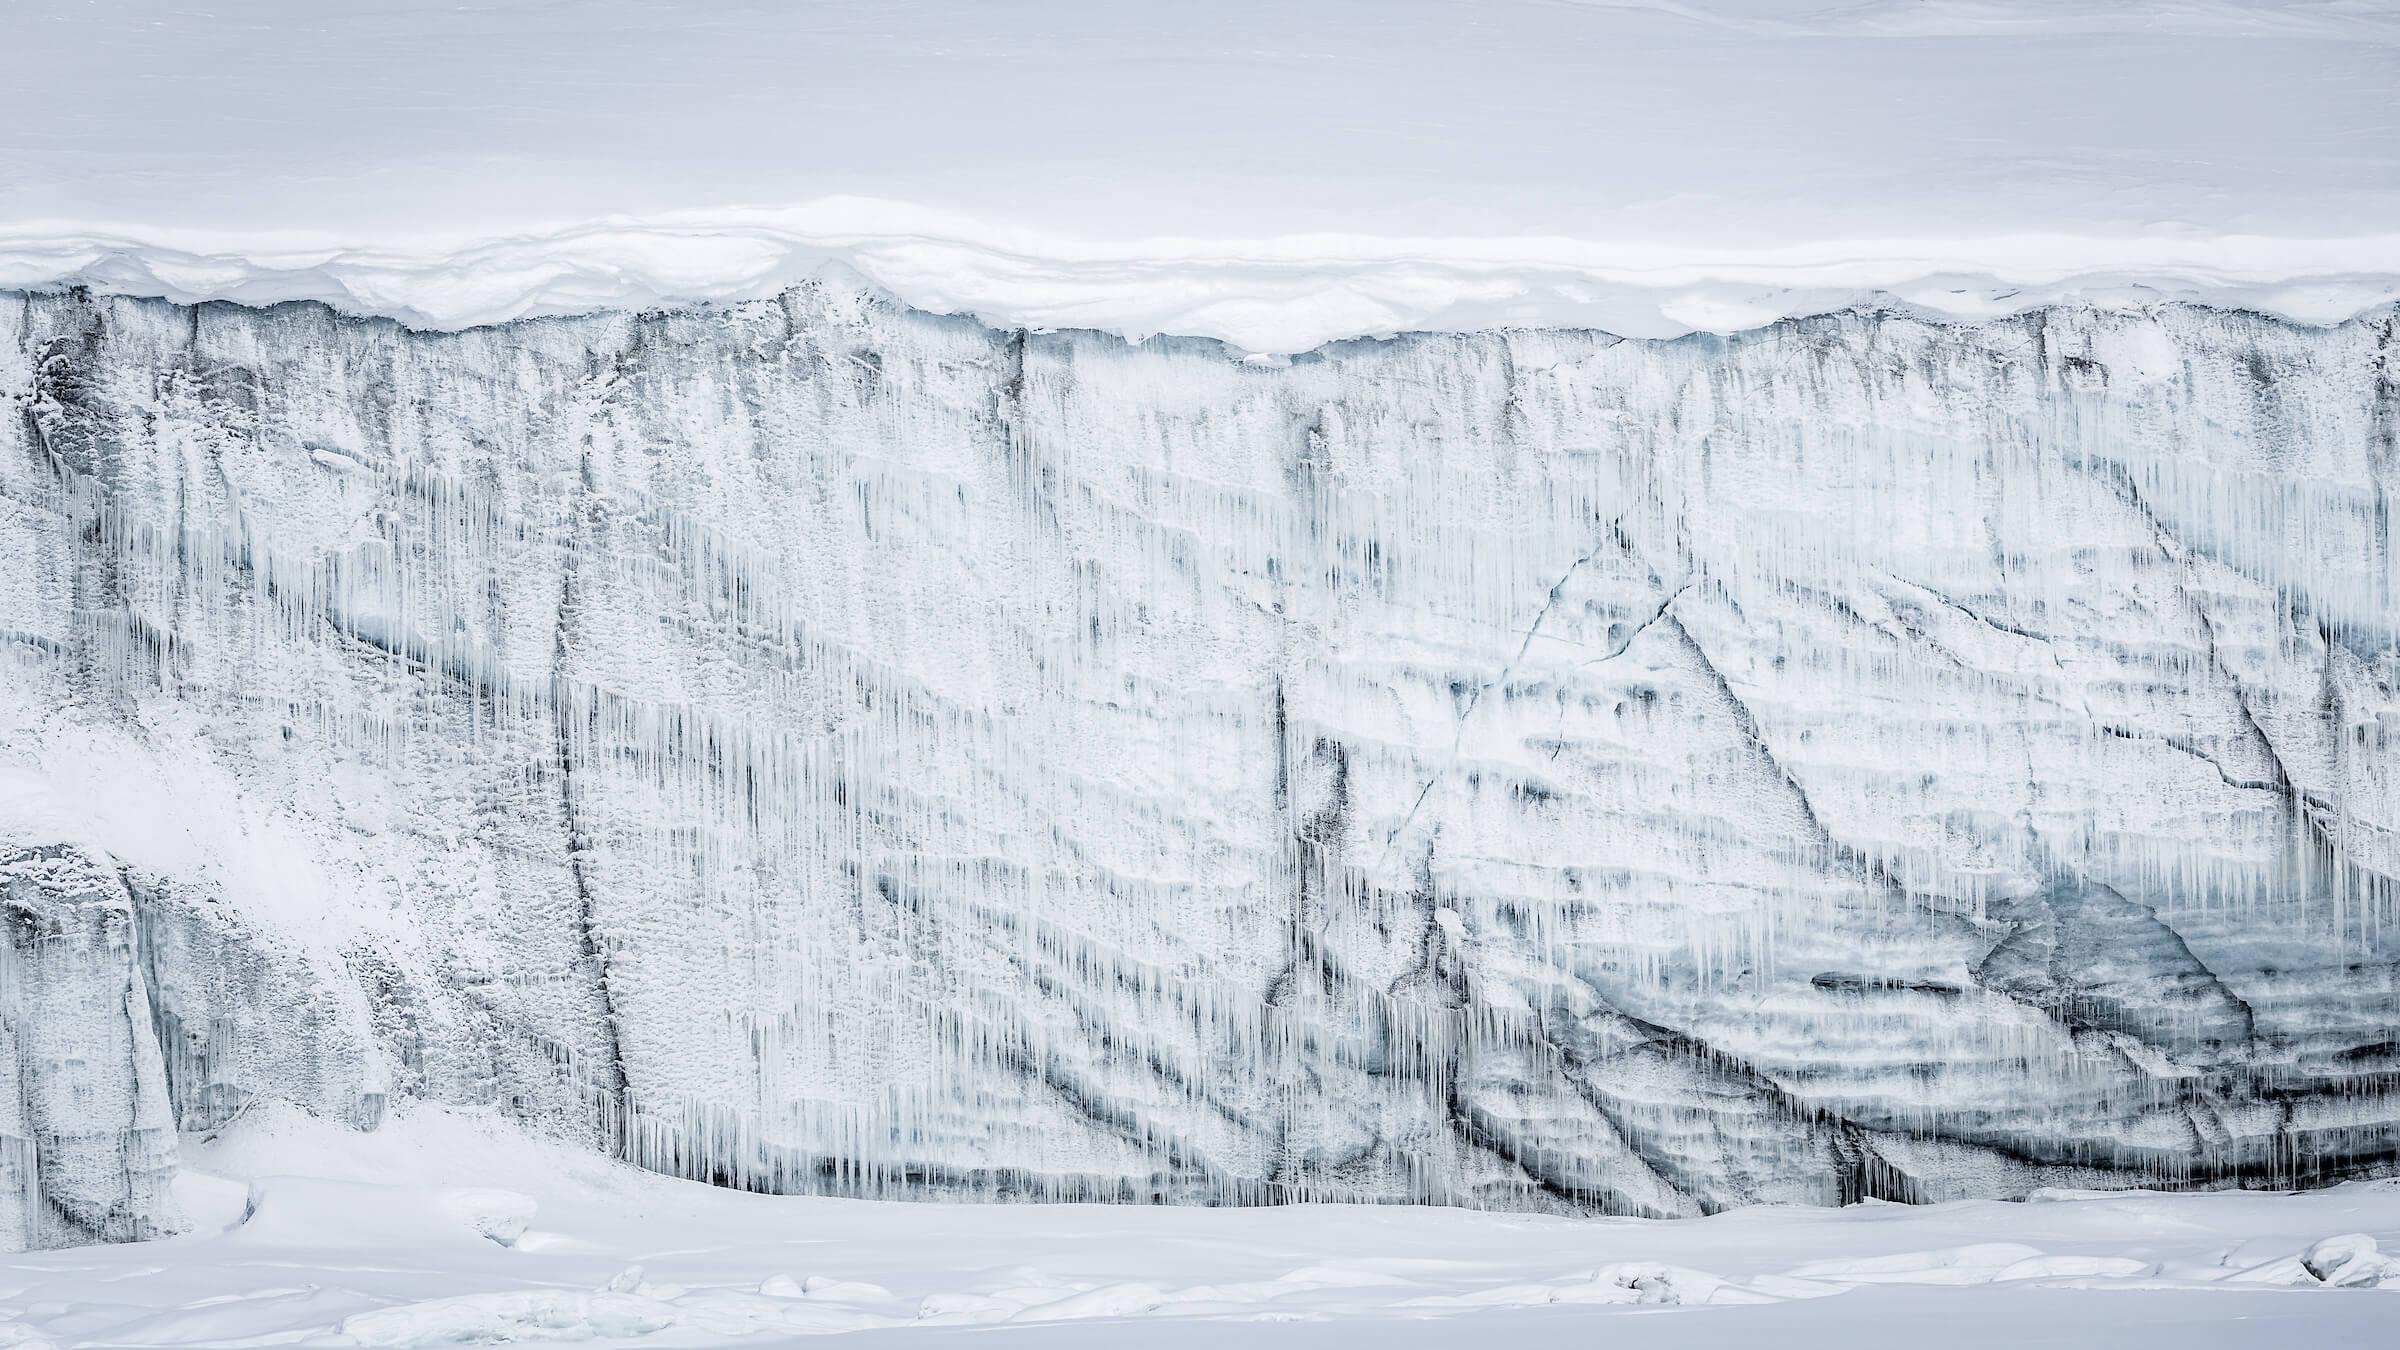 Even an iceberg itself can grow icesicles